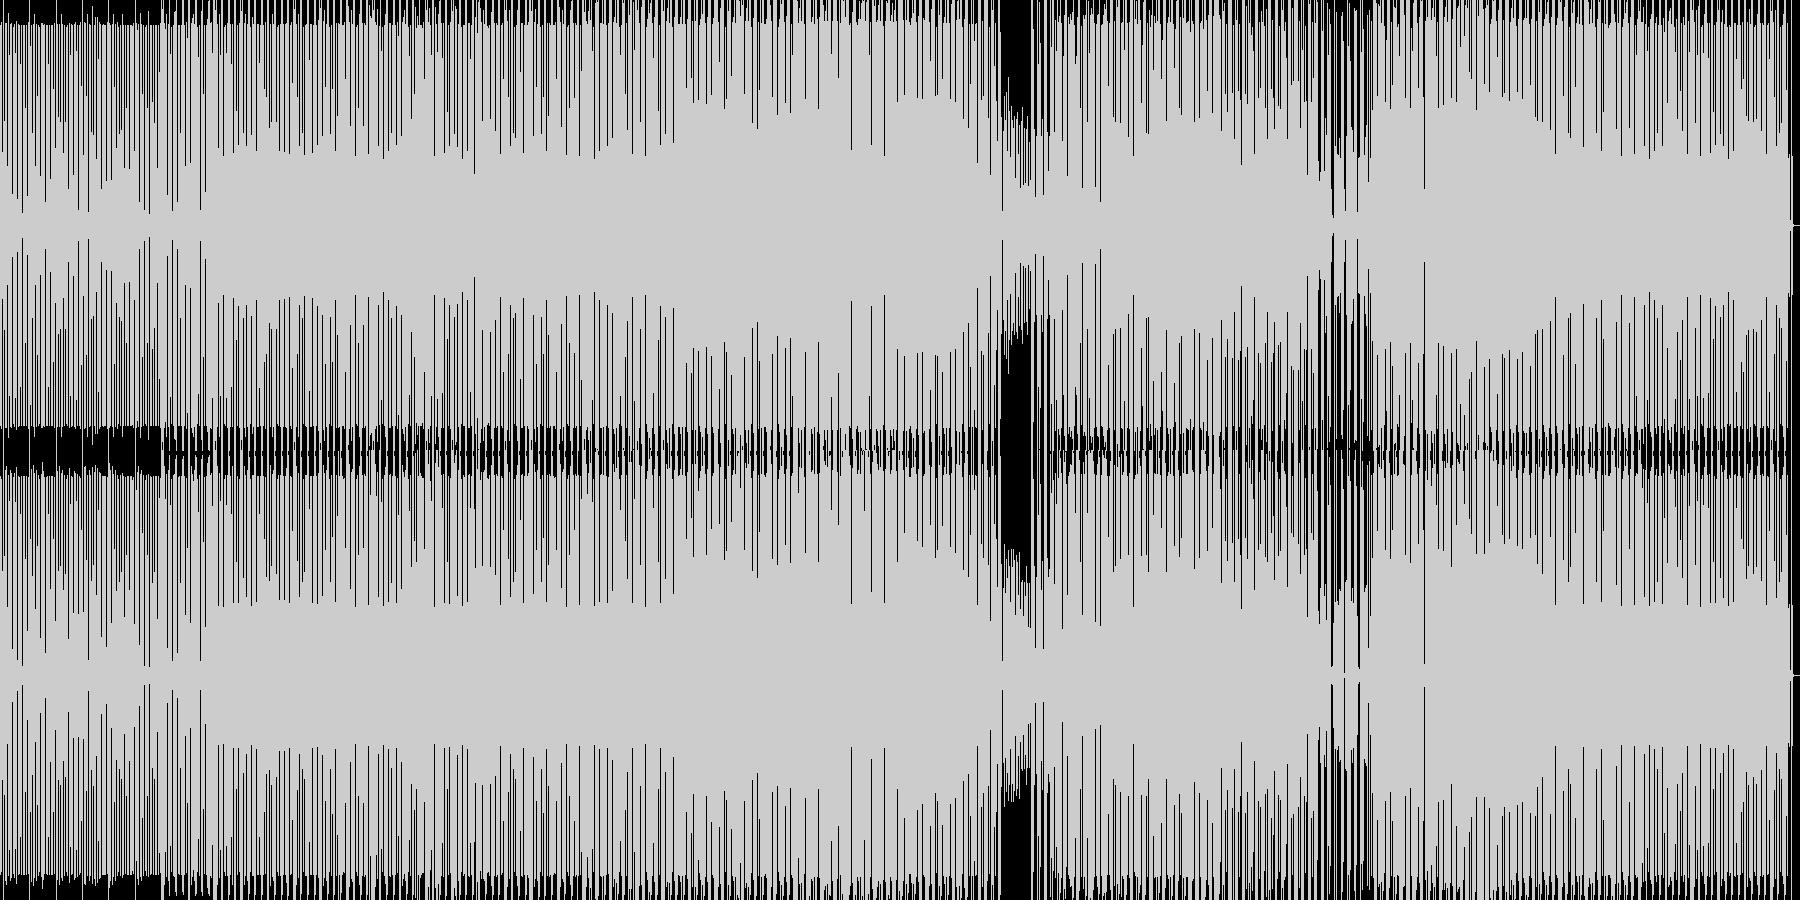 deepなミニマルハウスの未再生の波形